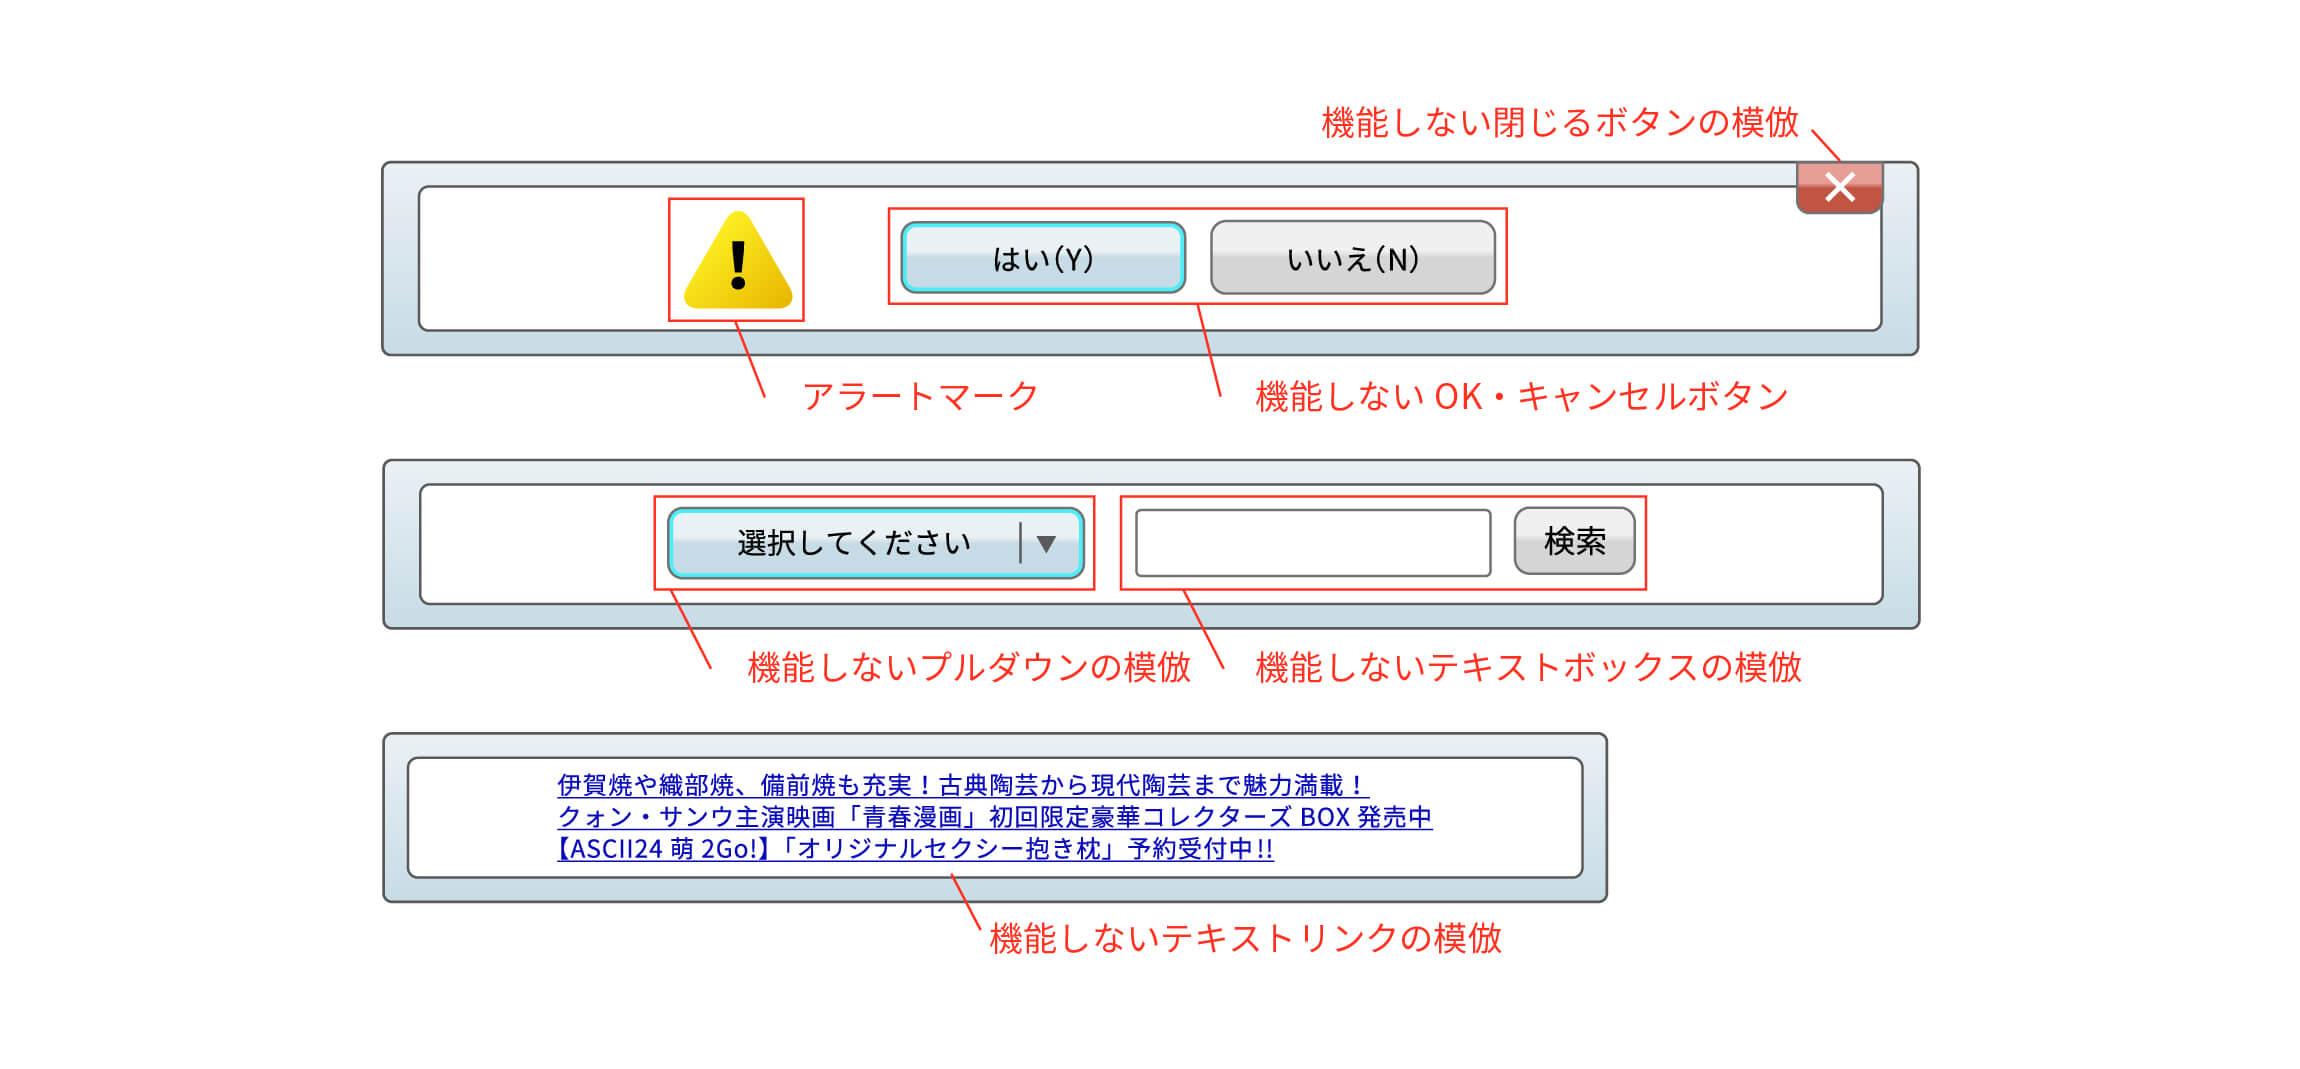 OSやウェブブラウザ機能の模倣、クリックアクション以外の操作を要求する広告表現